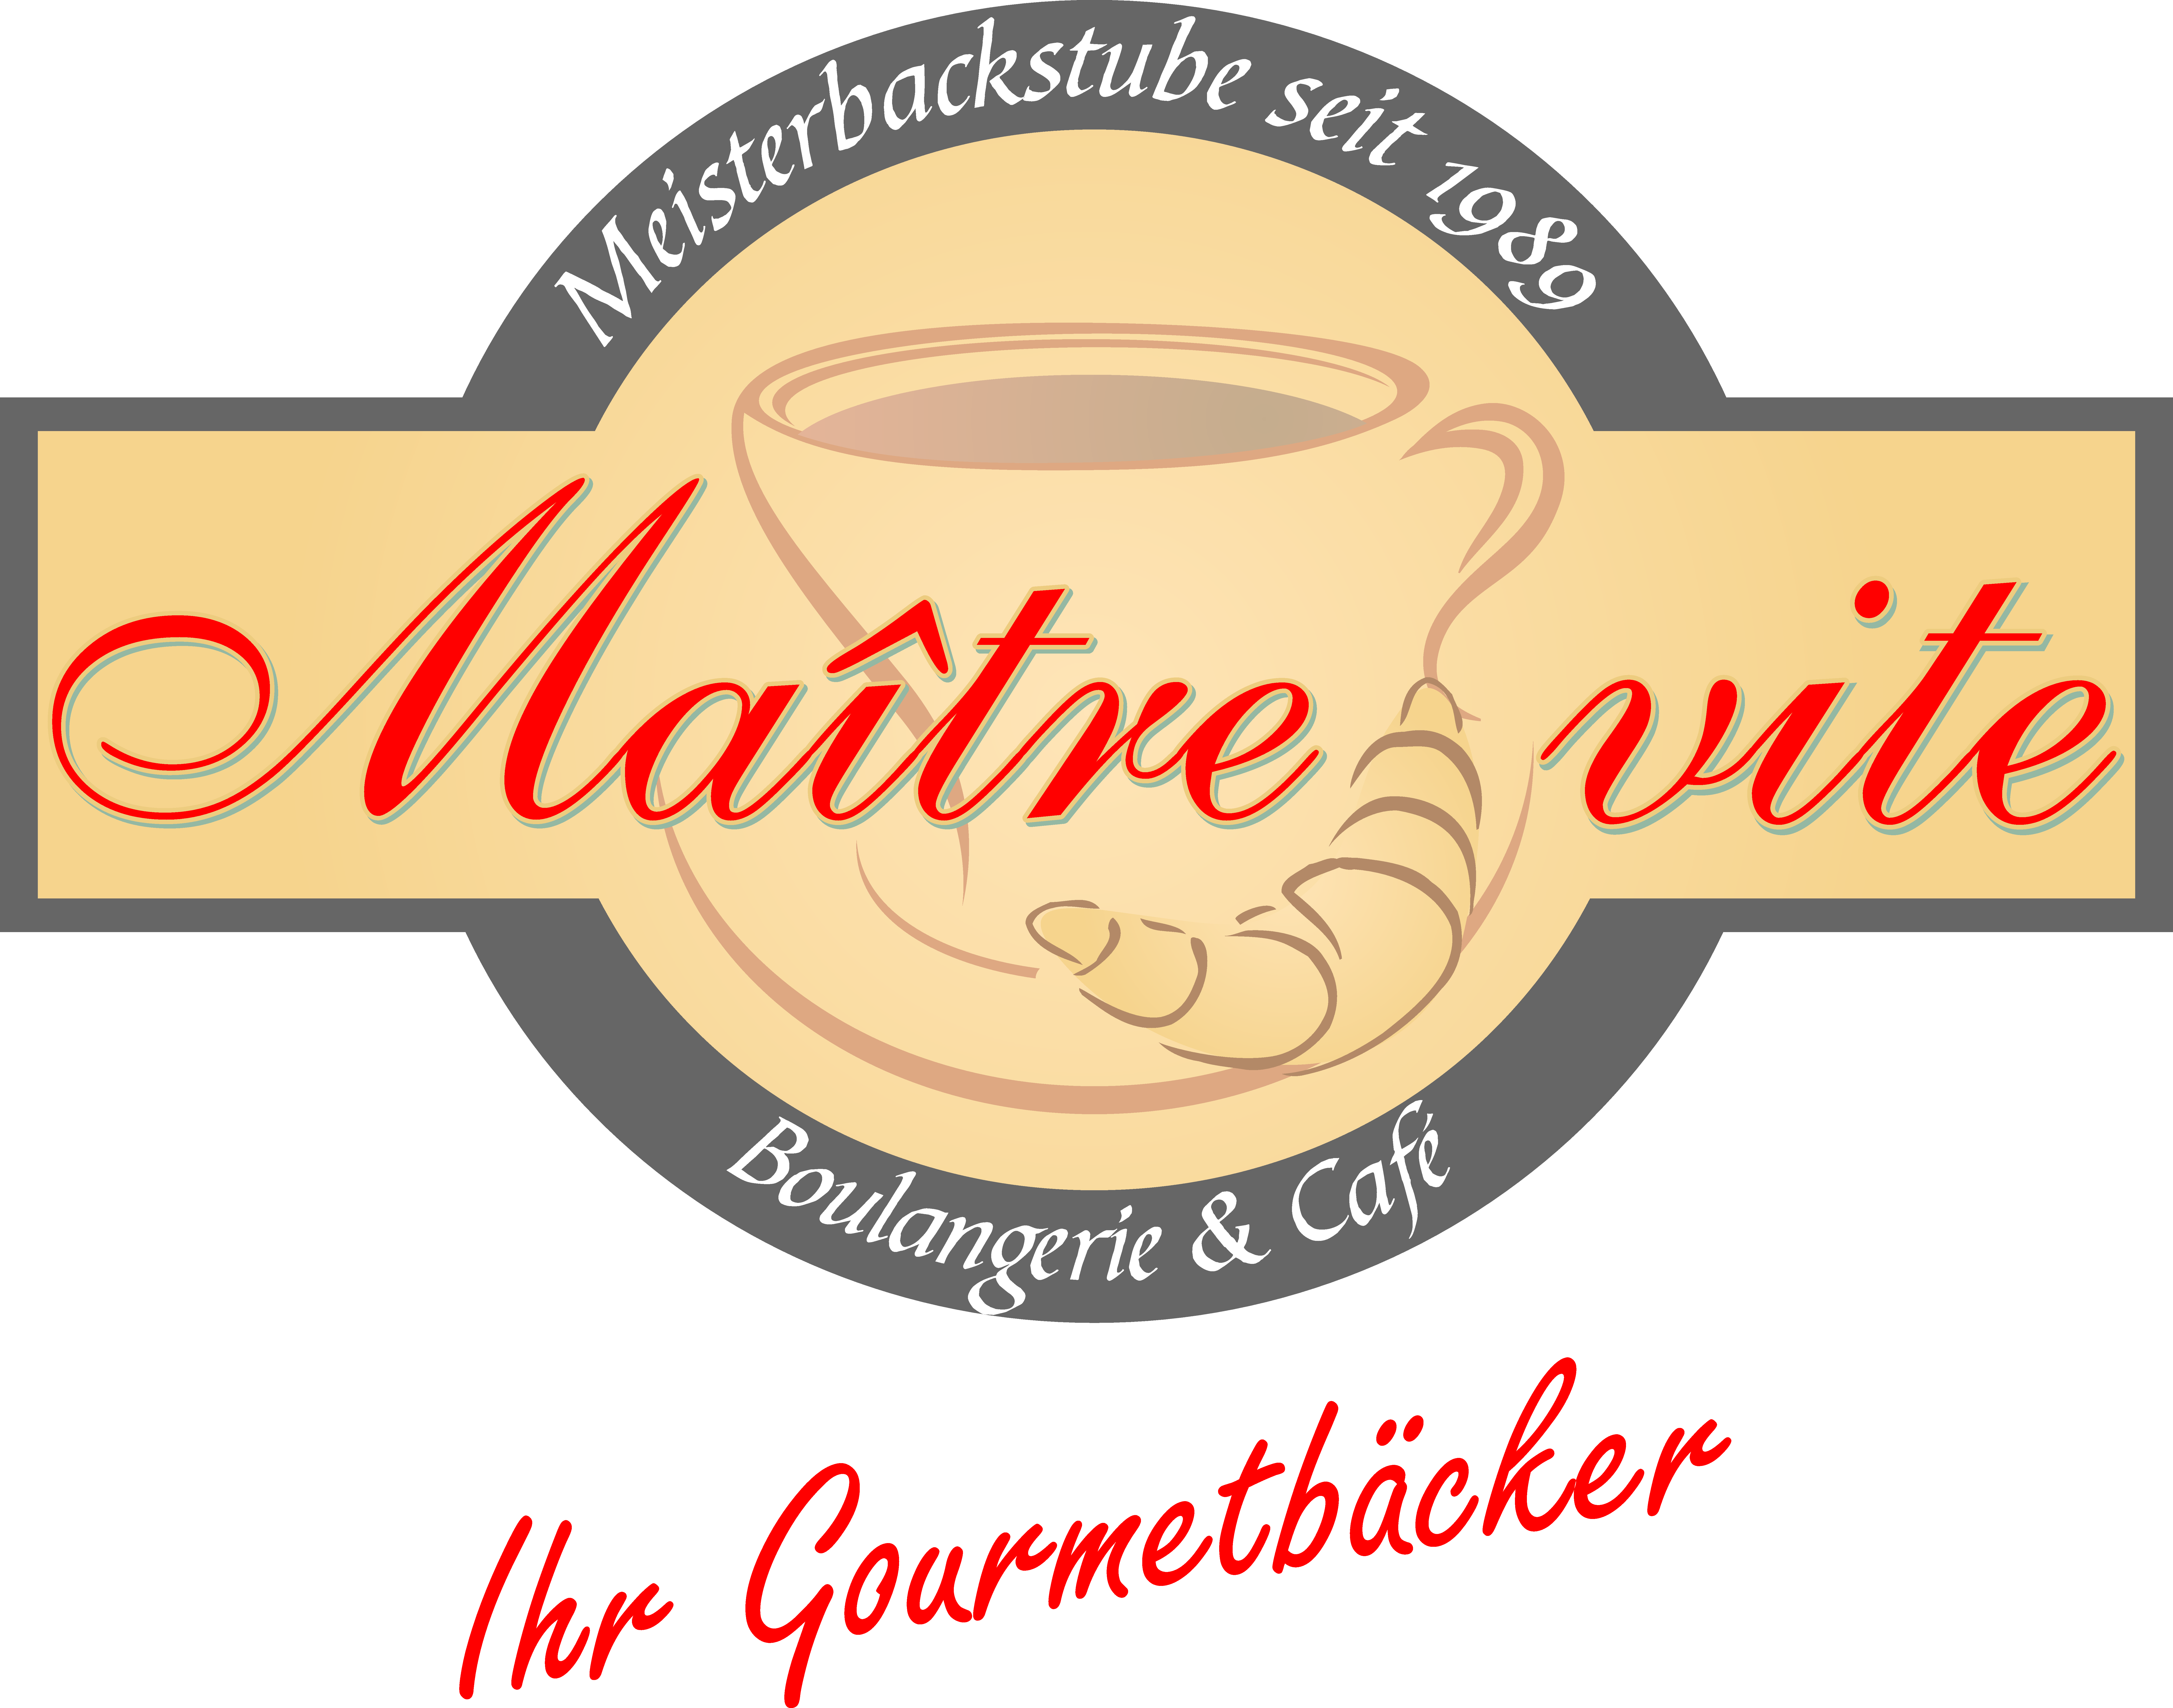 Maître vite - Ihr Gourmetbäcker